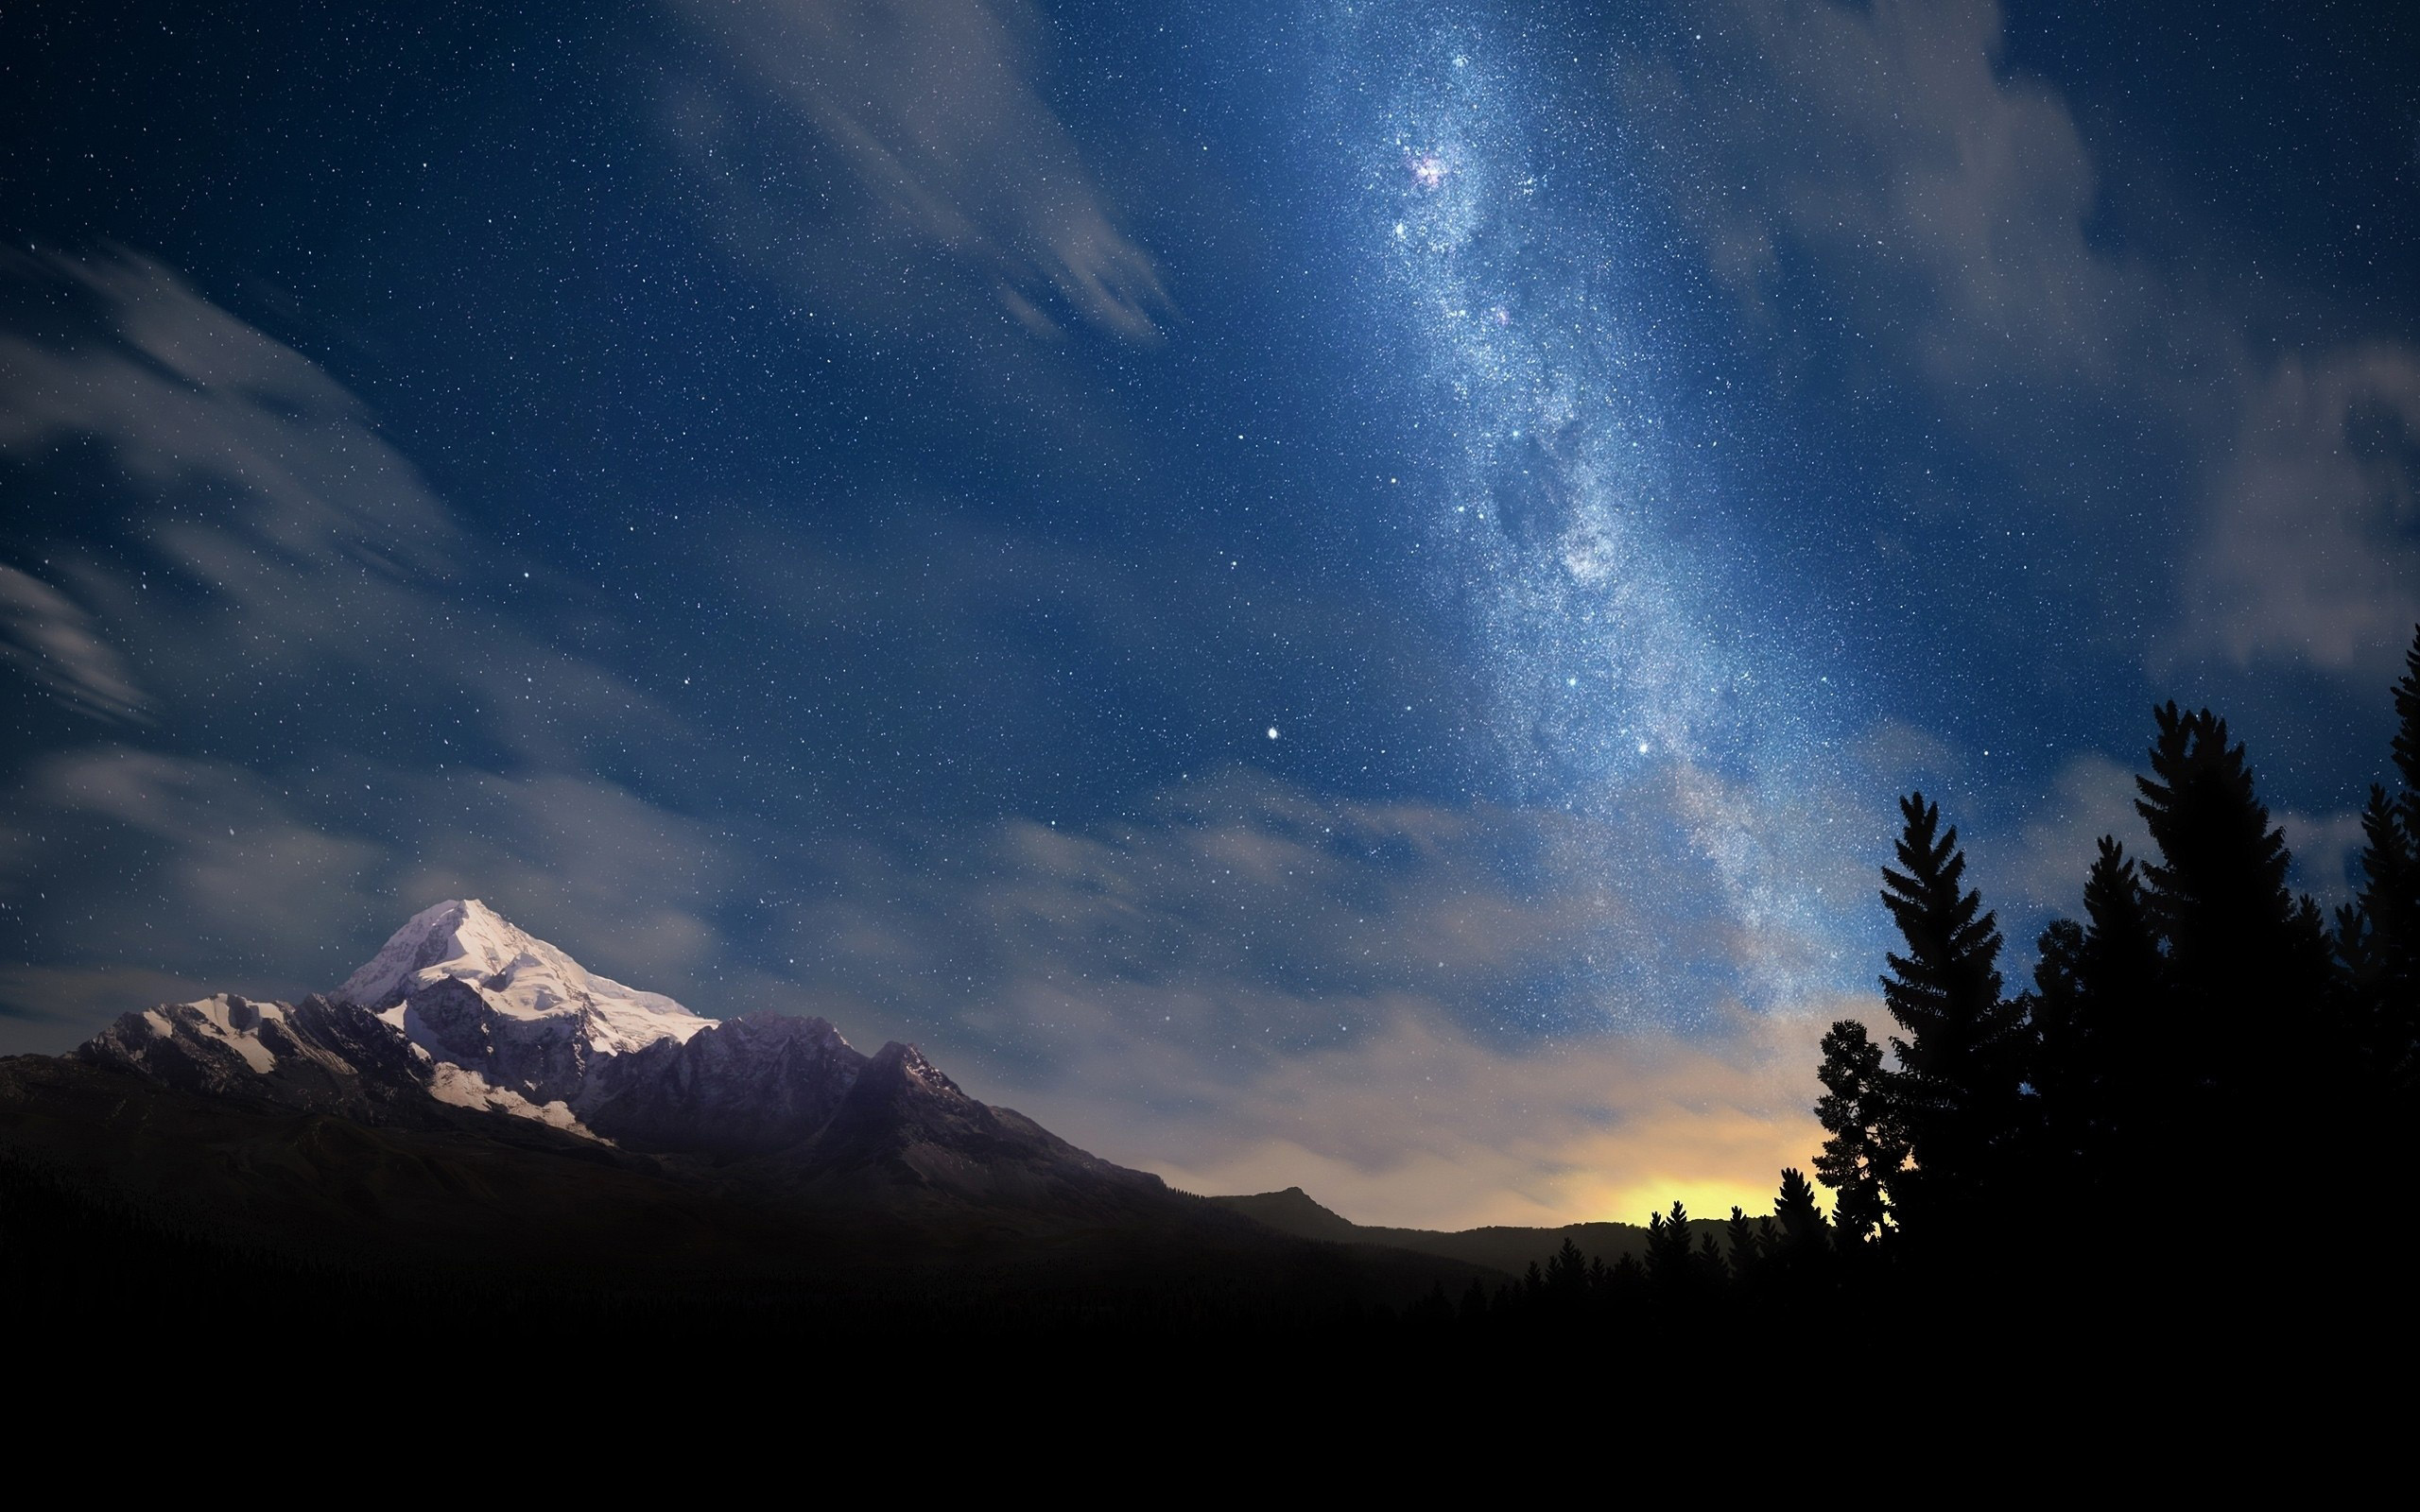 starry sky wallpaper 27481